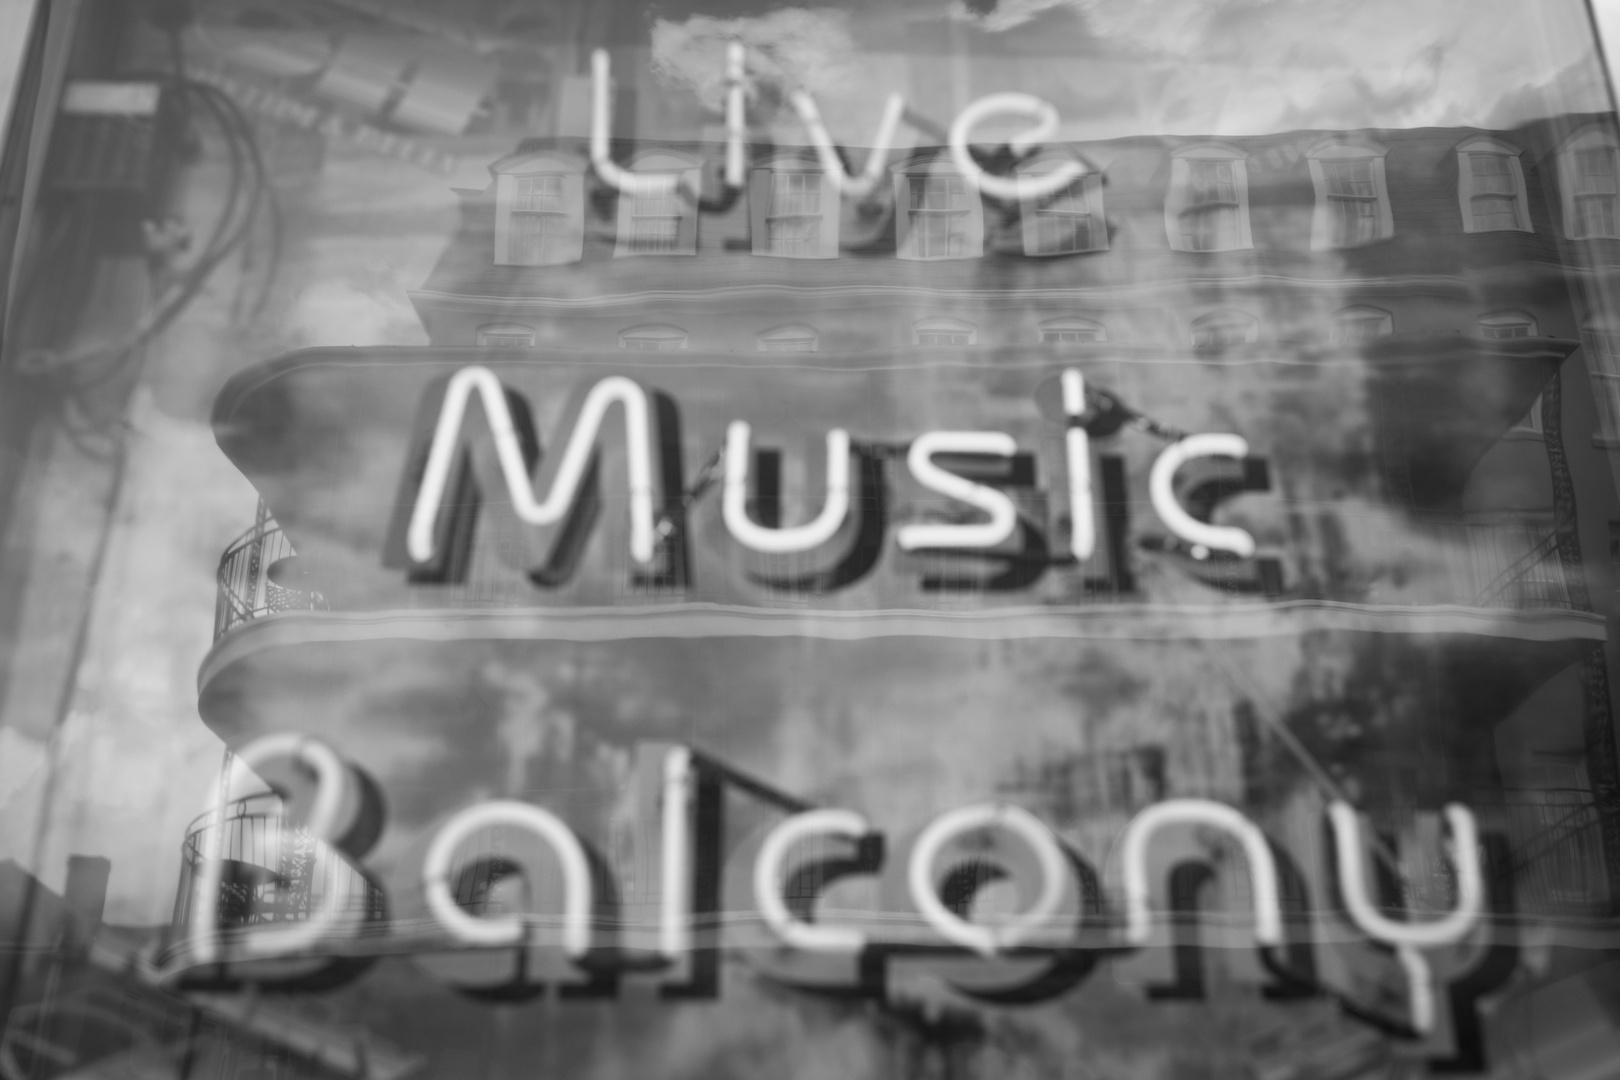 LIVE, MUSIC, BALCONY